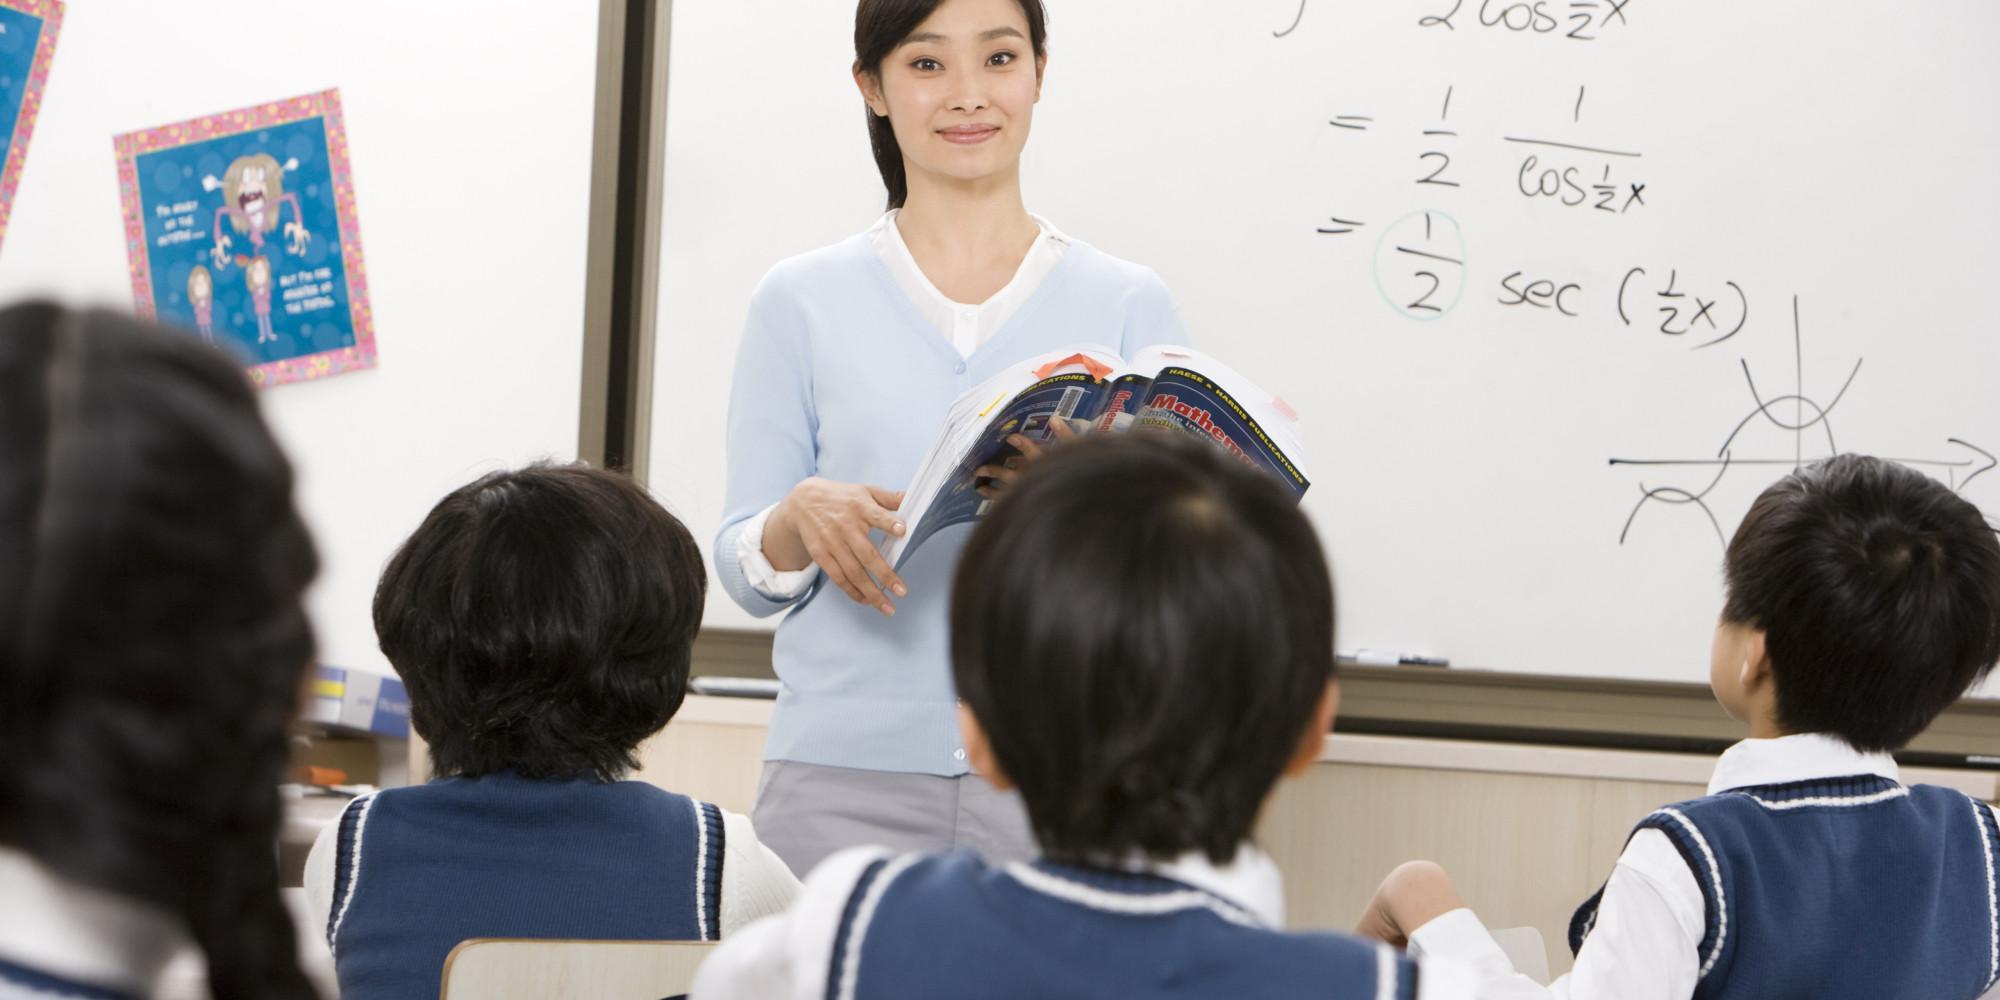 maths teacher chinese teachers china shanghai english math teaching class british numeracy international subjects